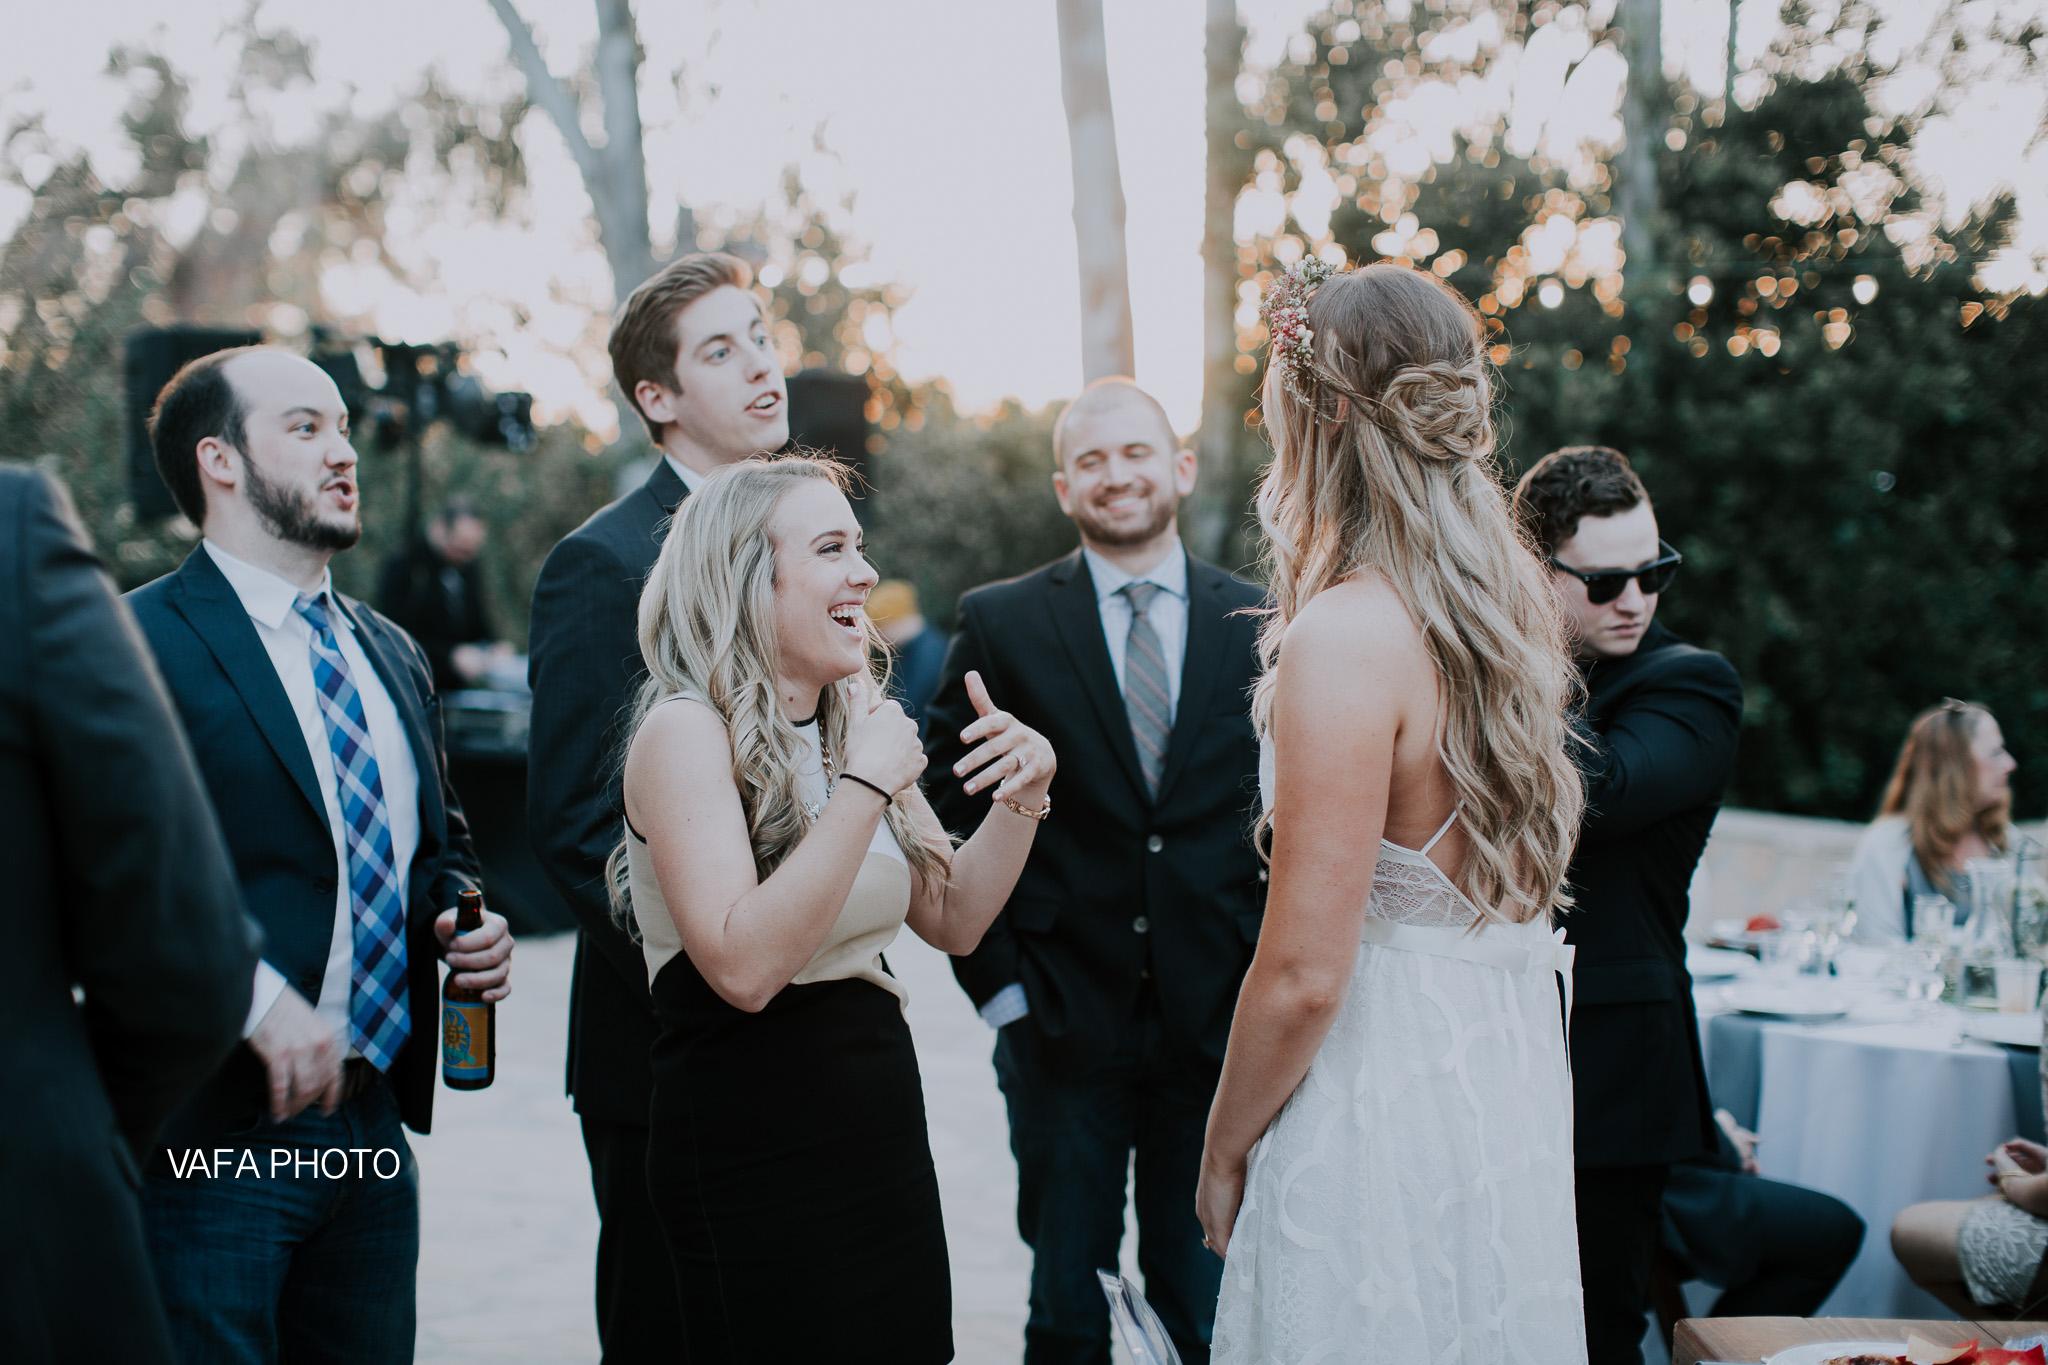 Leo-Carrillo-Ranch-Wedding-Lauren-Mike-Vafa-Photo-1052.jpg